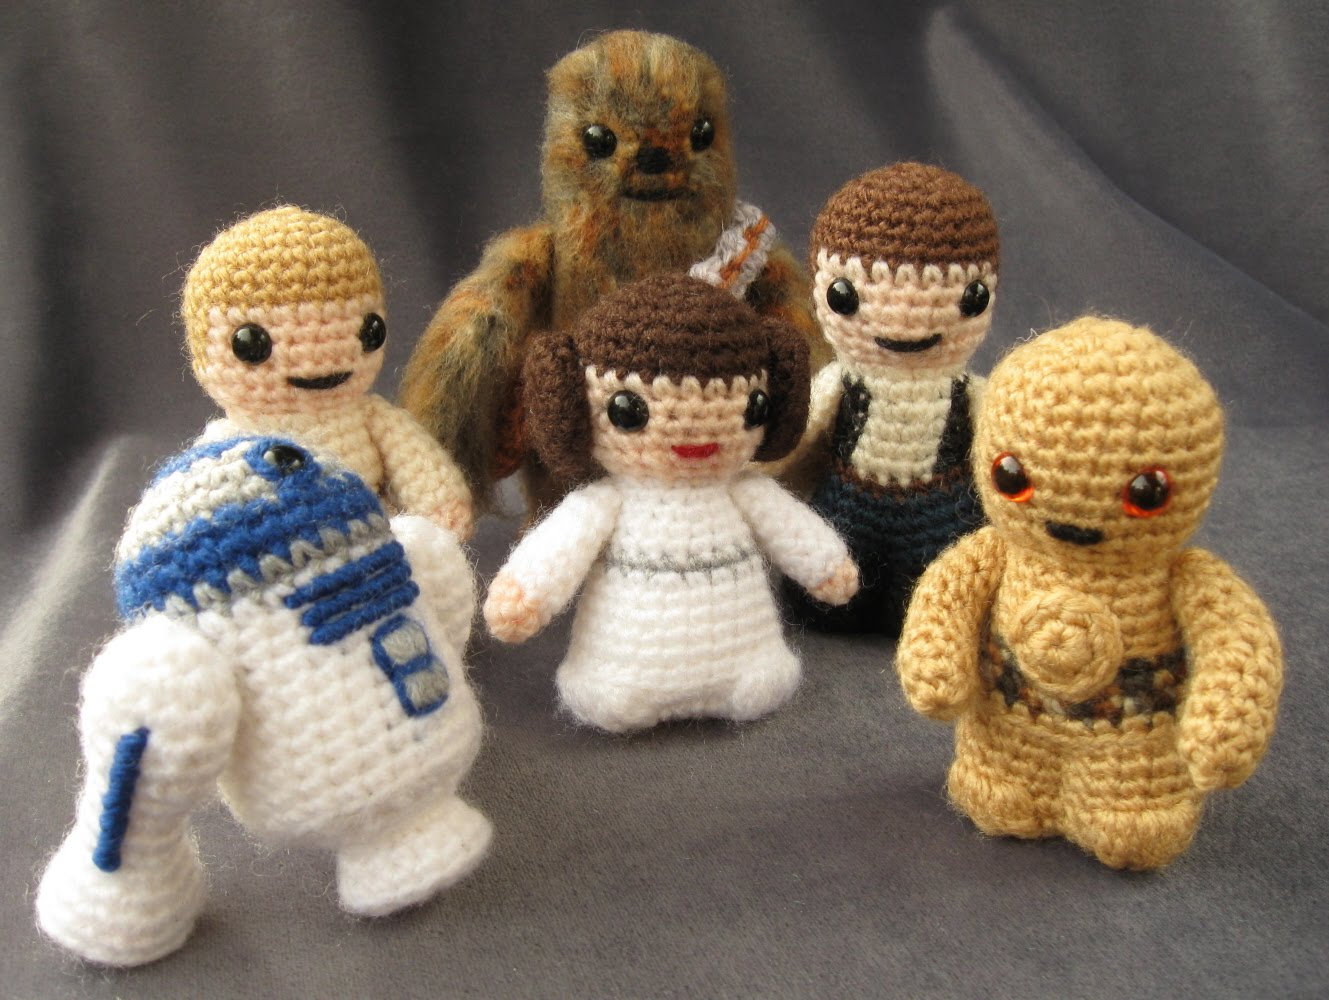 Free Crochet Pattern Small Doll : Entre Hilos y Puntadas: Amigurumi star wars & Lord of the ring